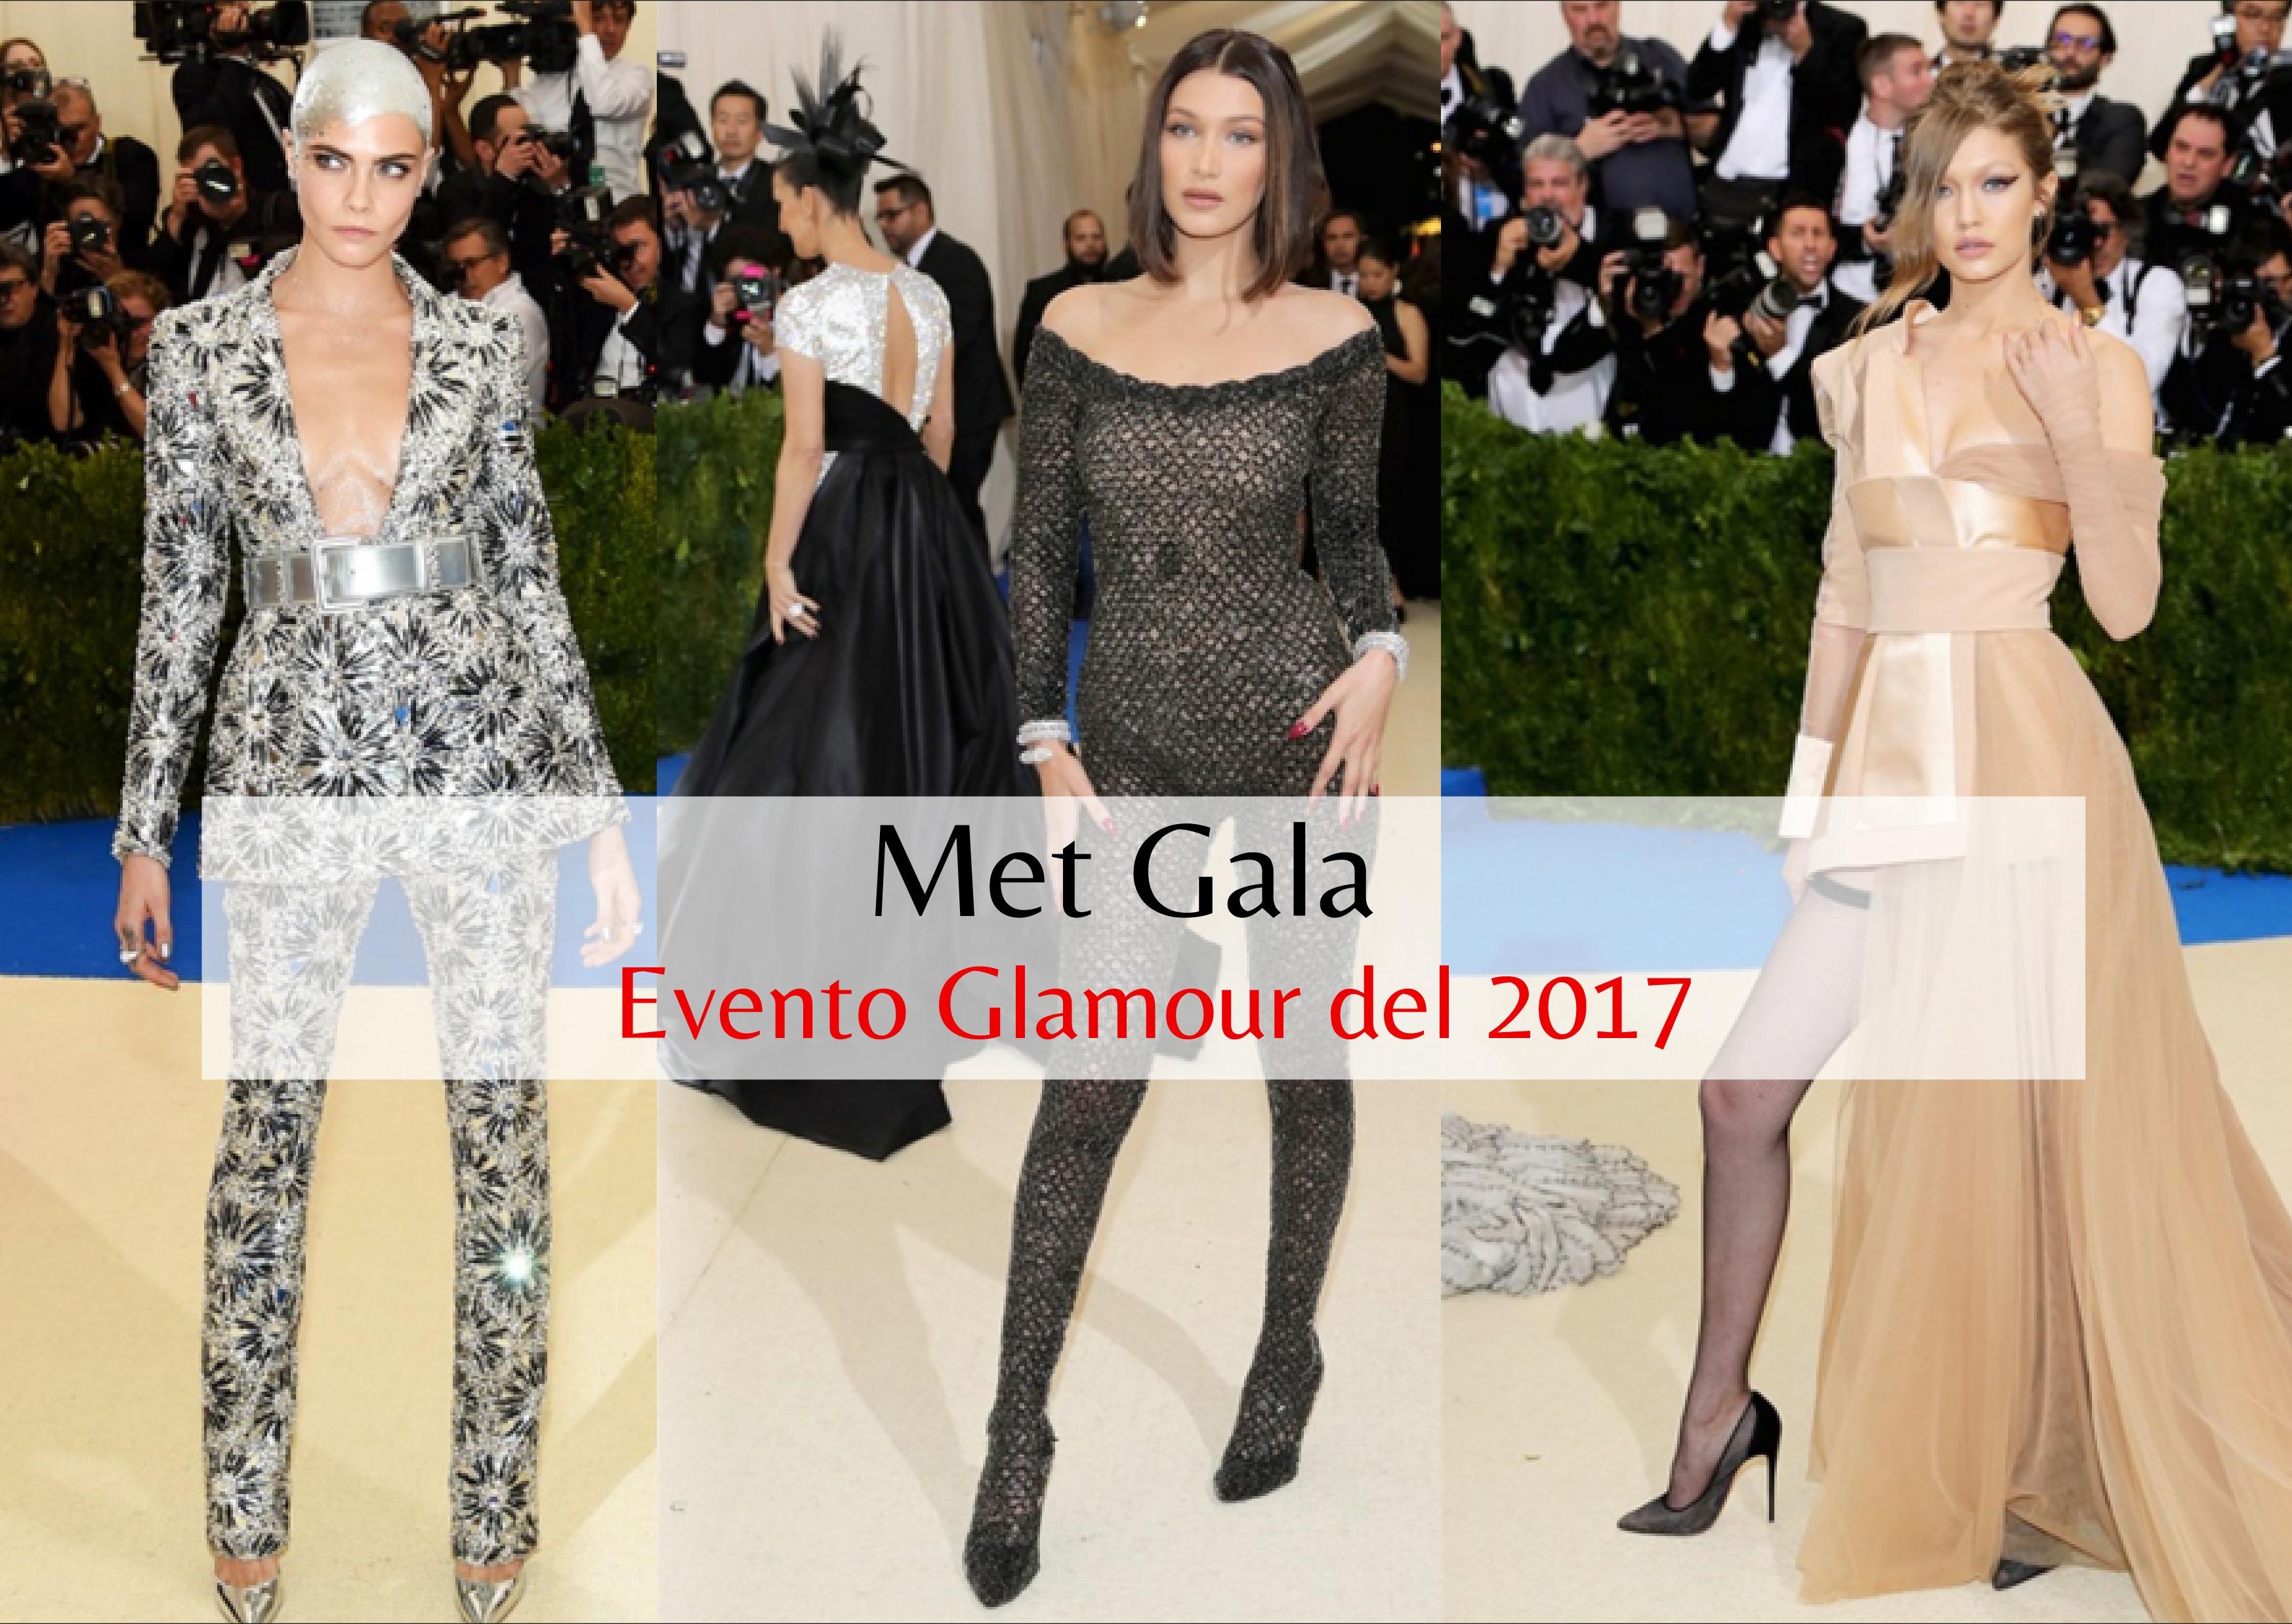 fc013f280 Met Gala 2017 - Simone Tomasini